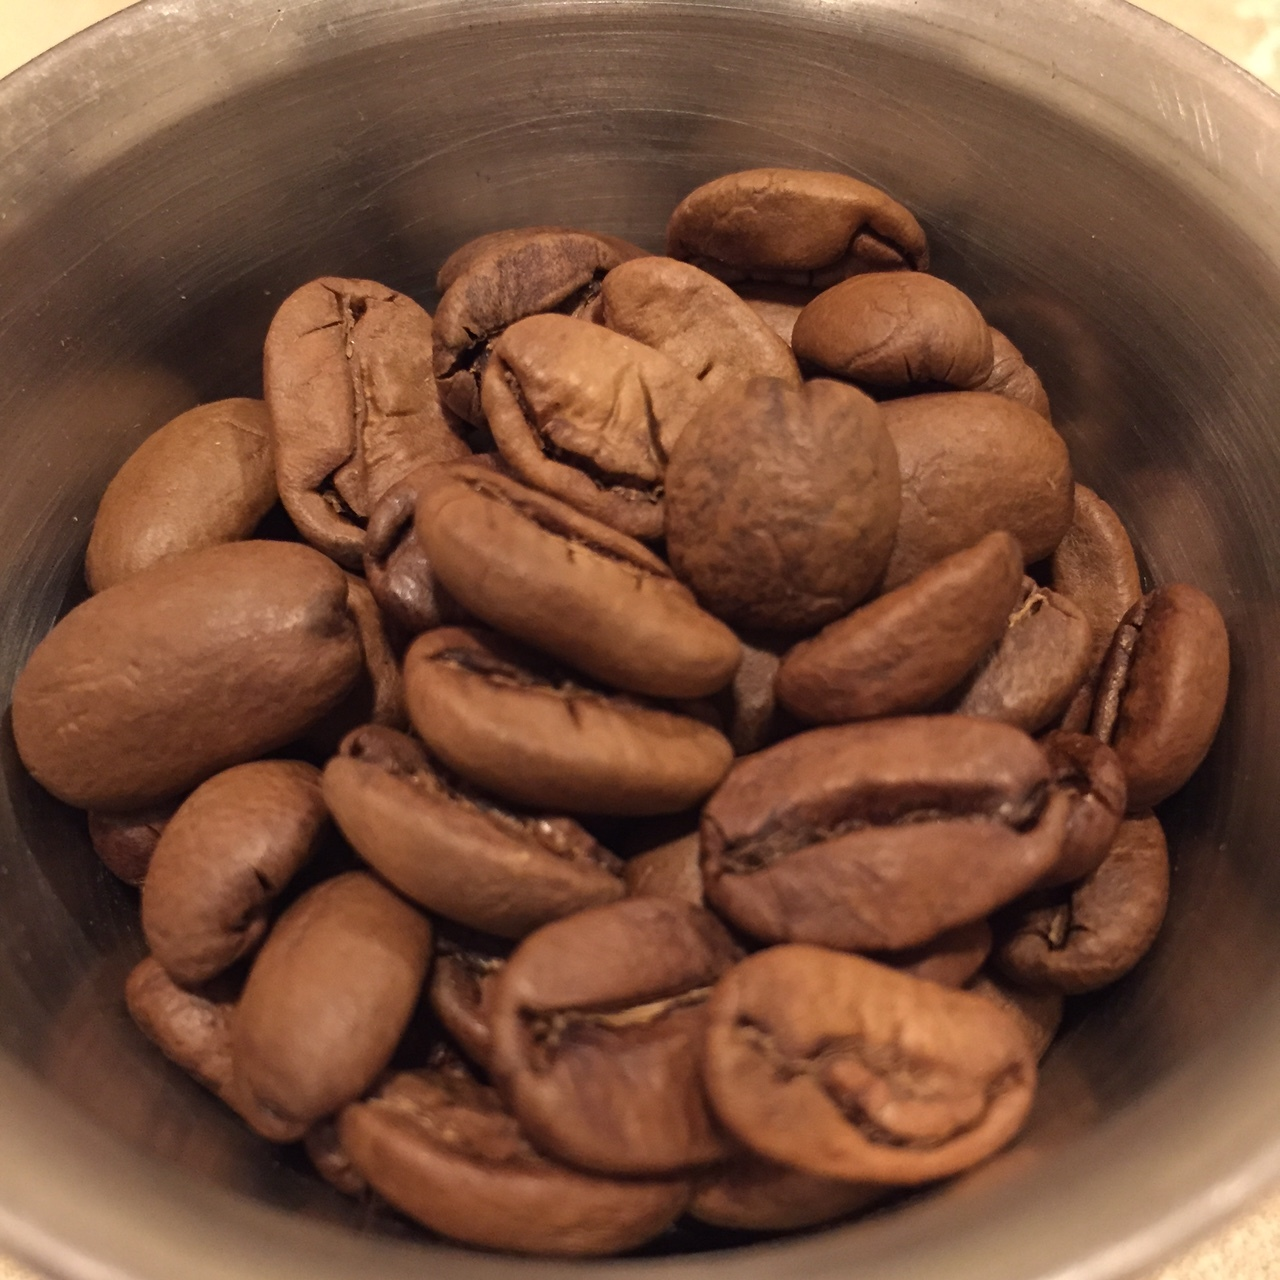 Very large light brown Pacamara varietal beans.